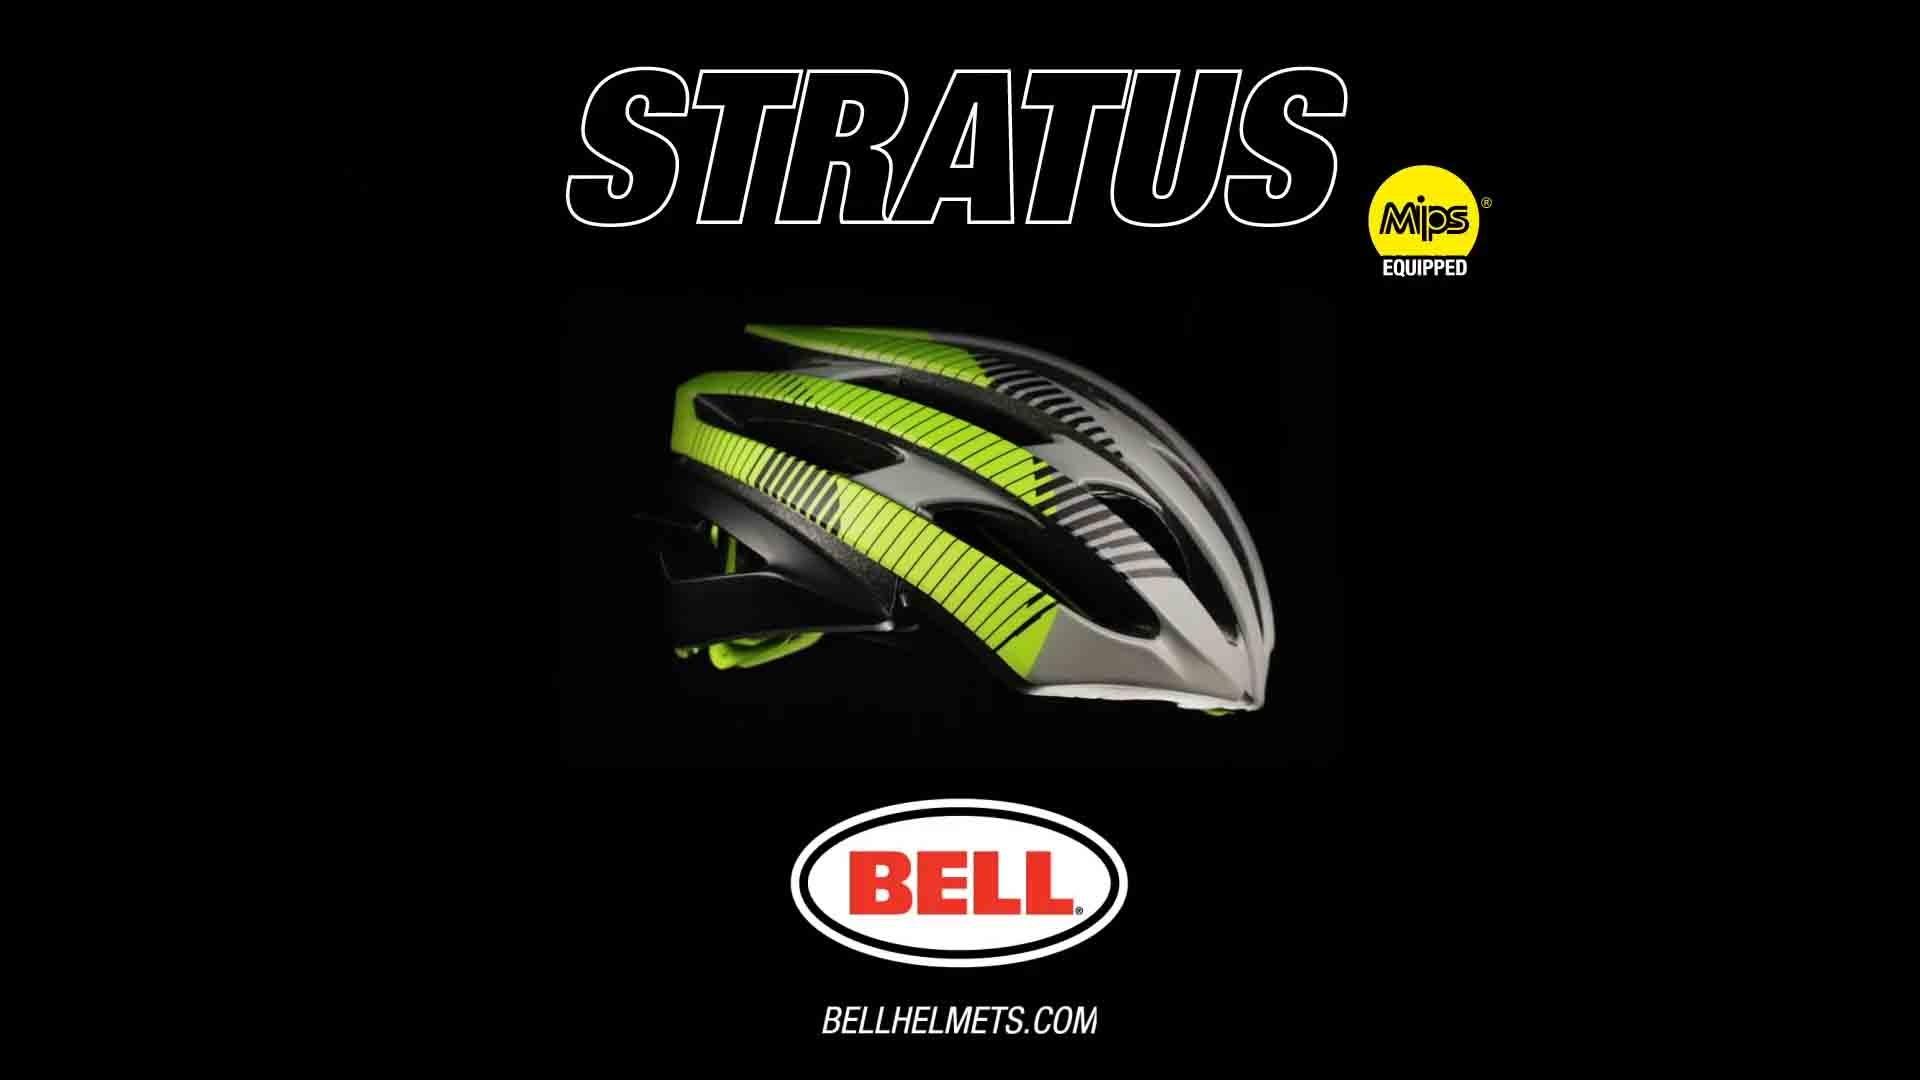 Stratus MIPS Tech Video | Bell Helmets